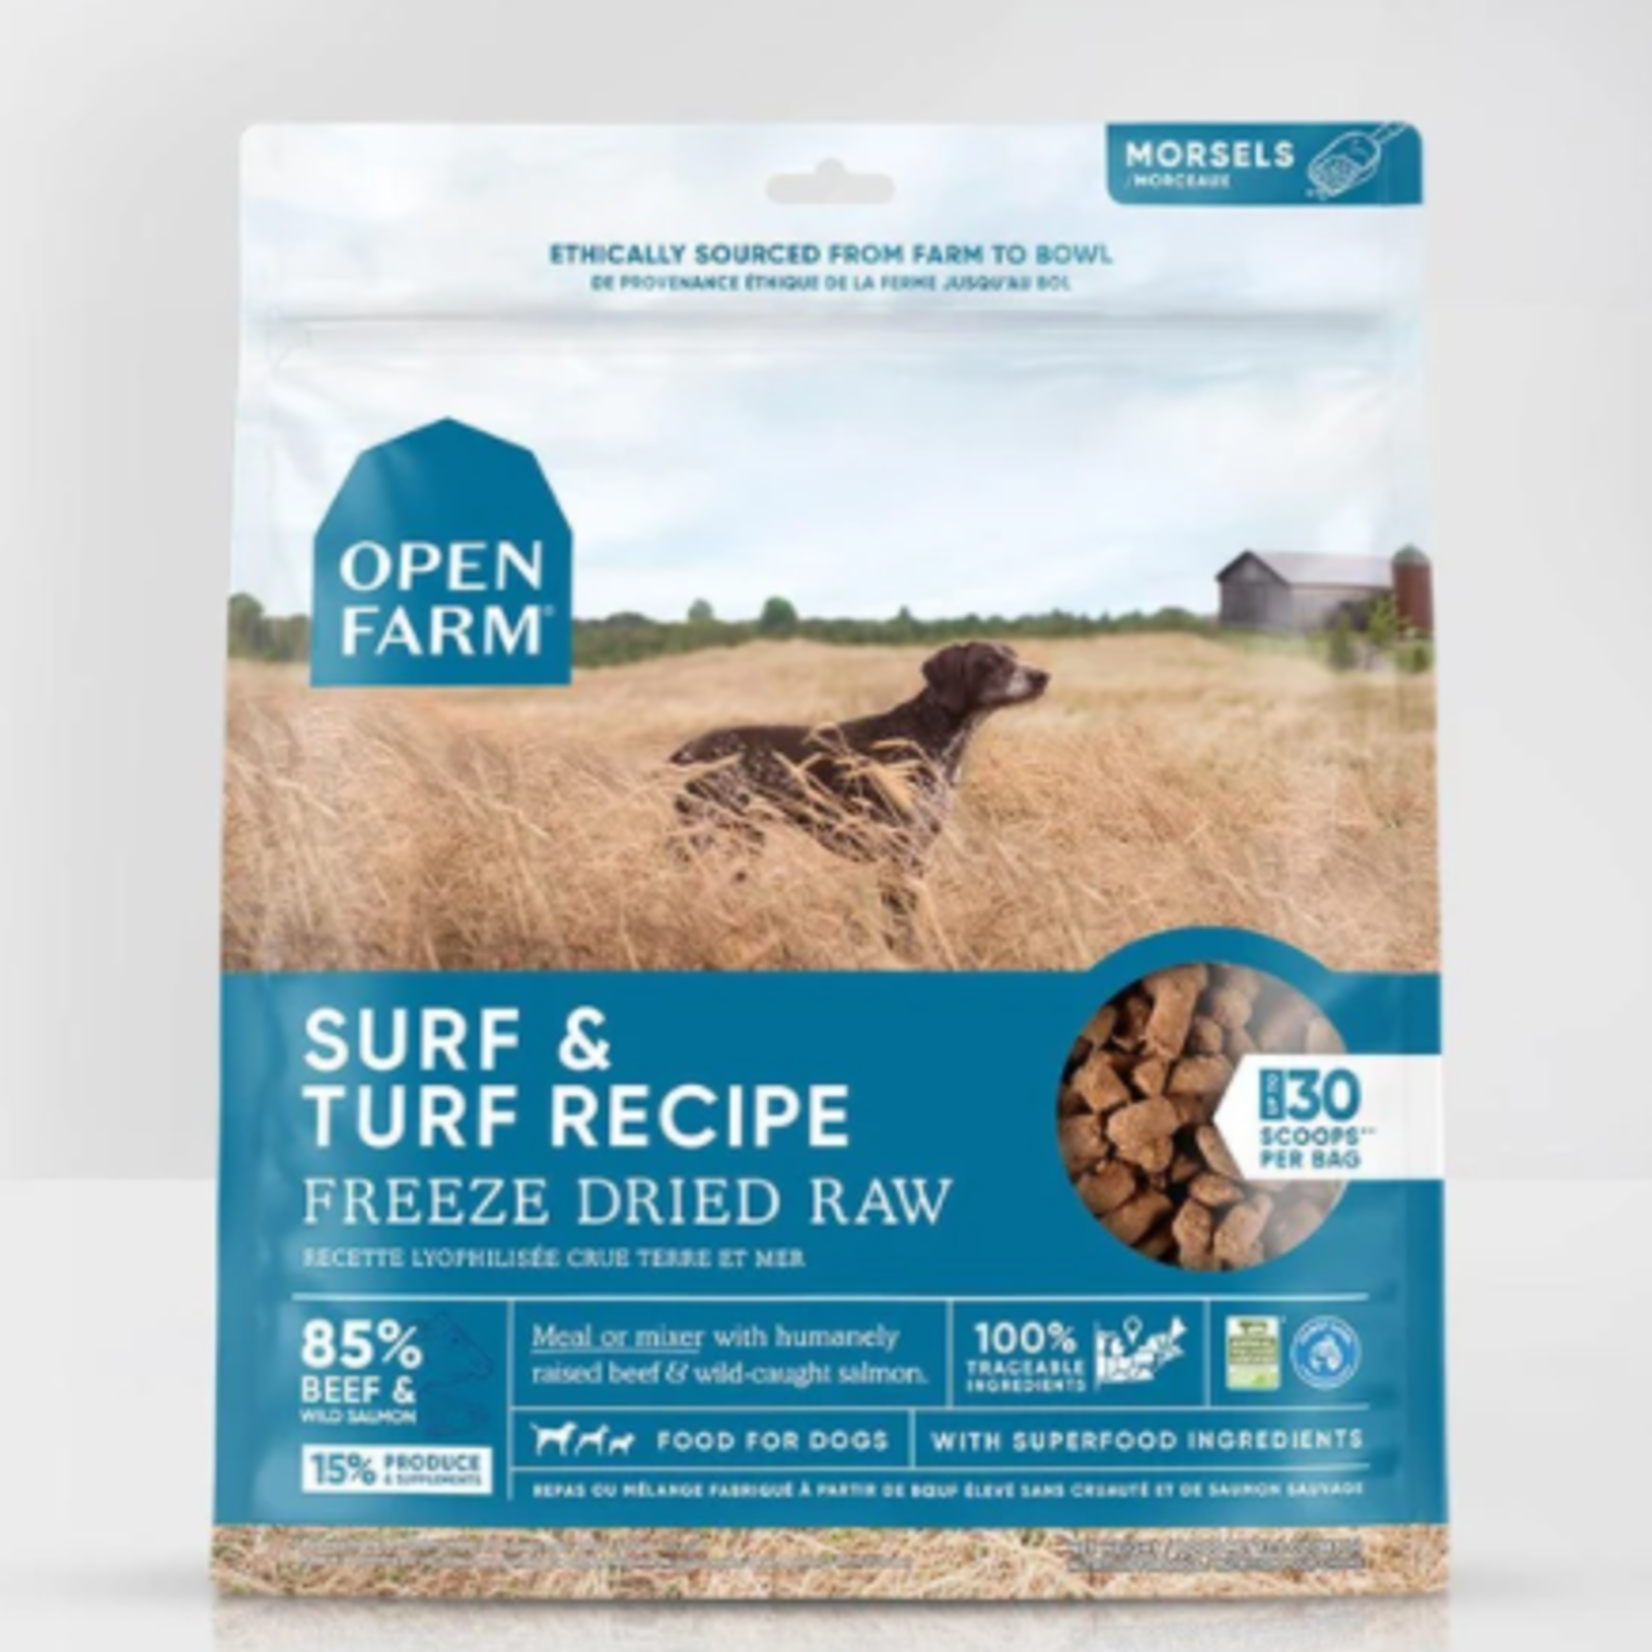 Open Farm Surf & Turf Morsels-Freeze Dry Raw-3.5 oz